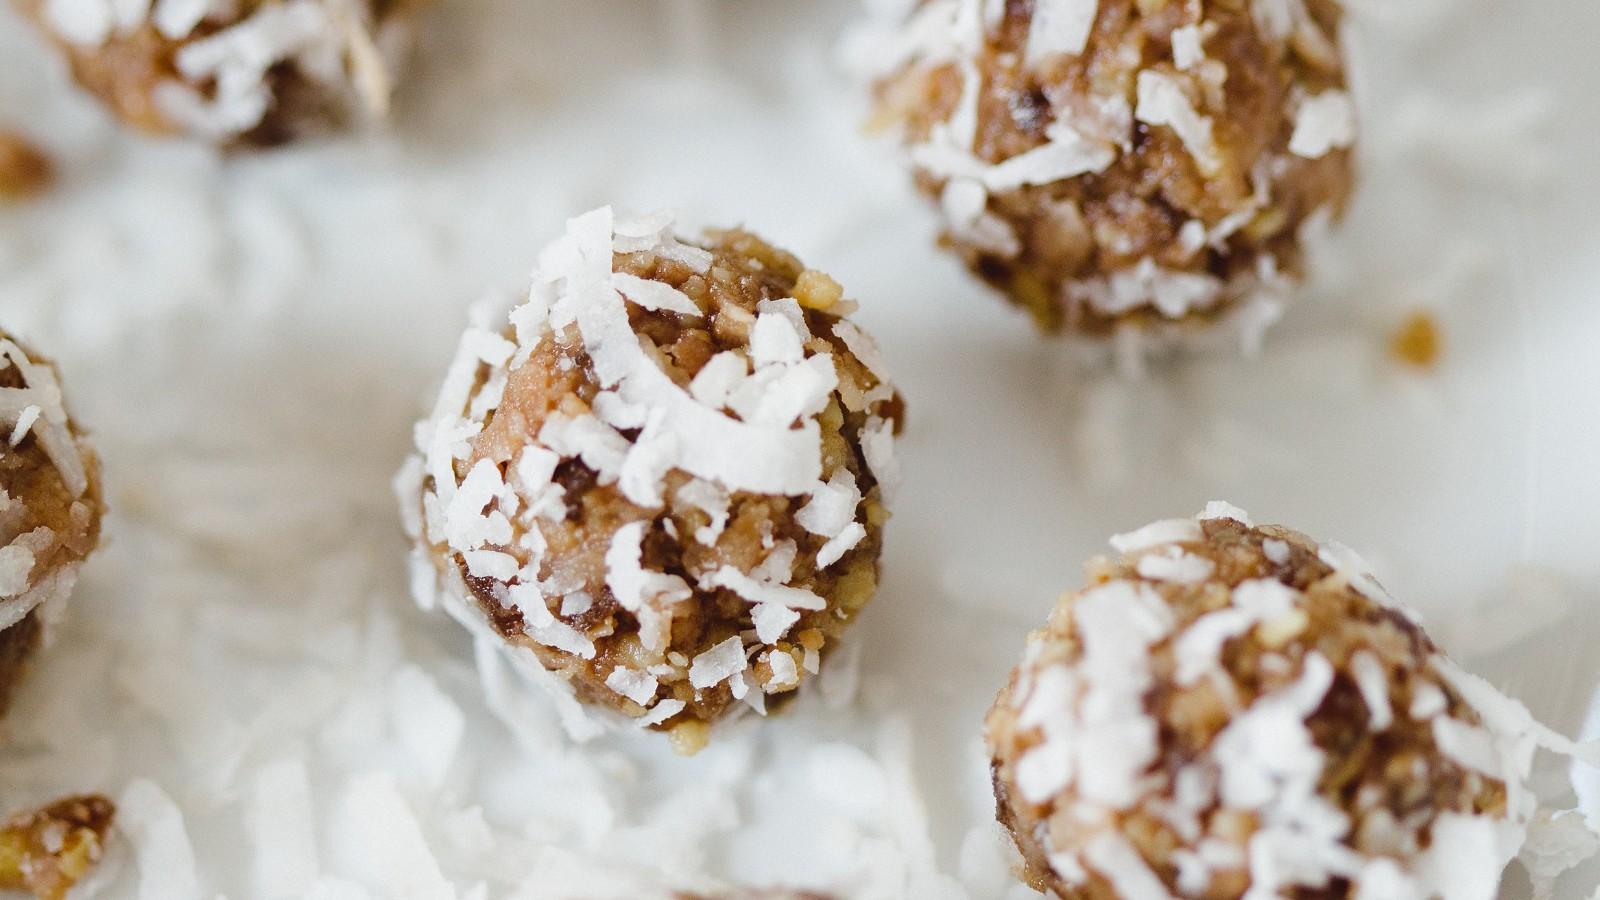 Image of Chocolate Tahini Date Bites